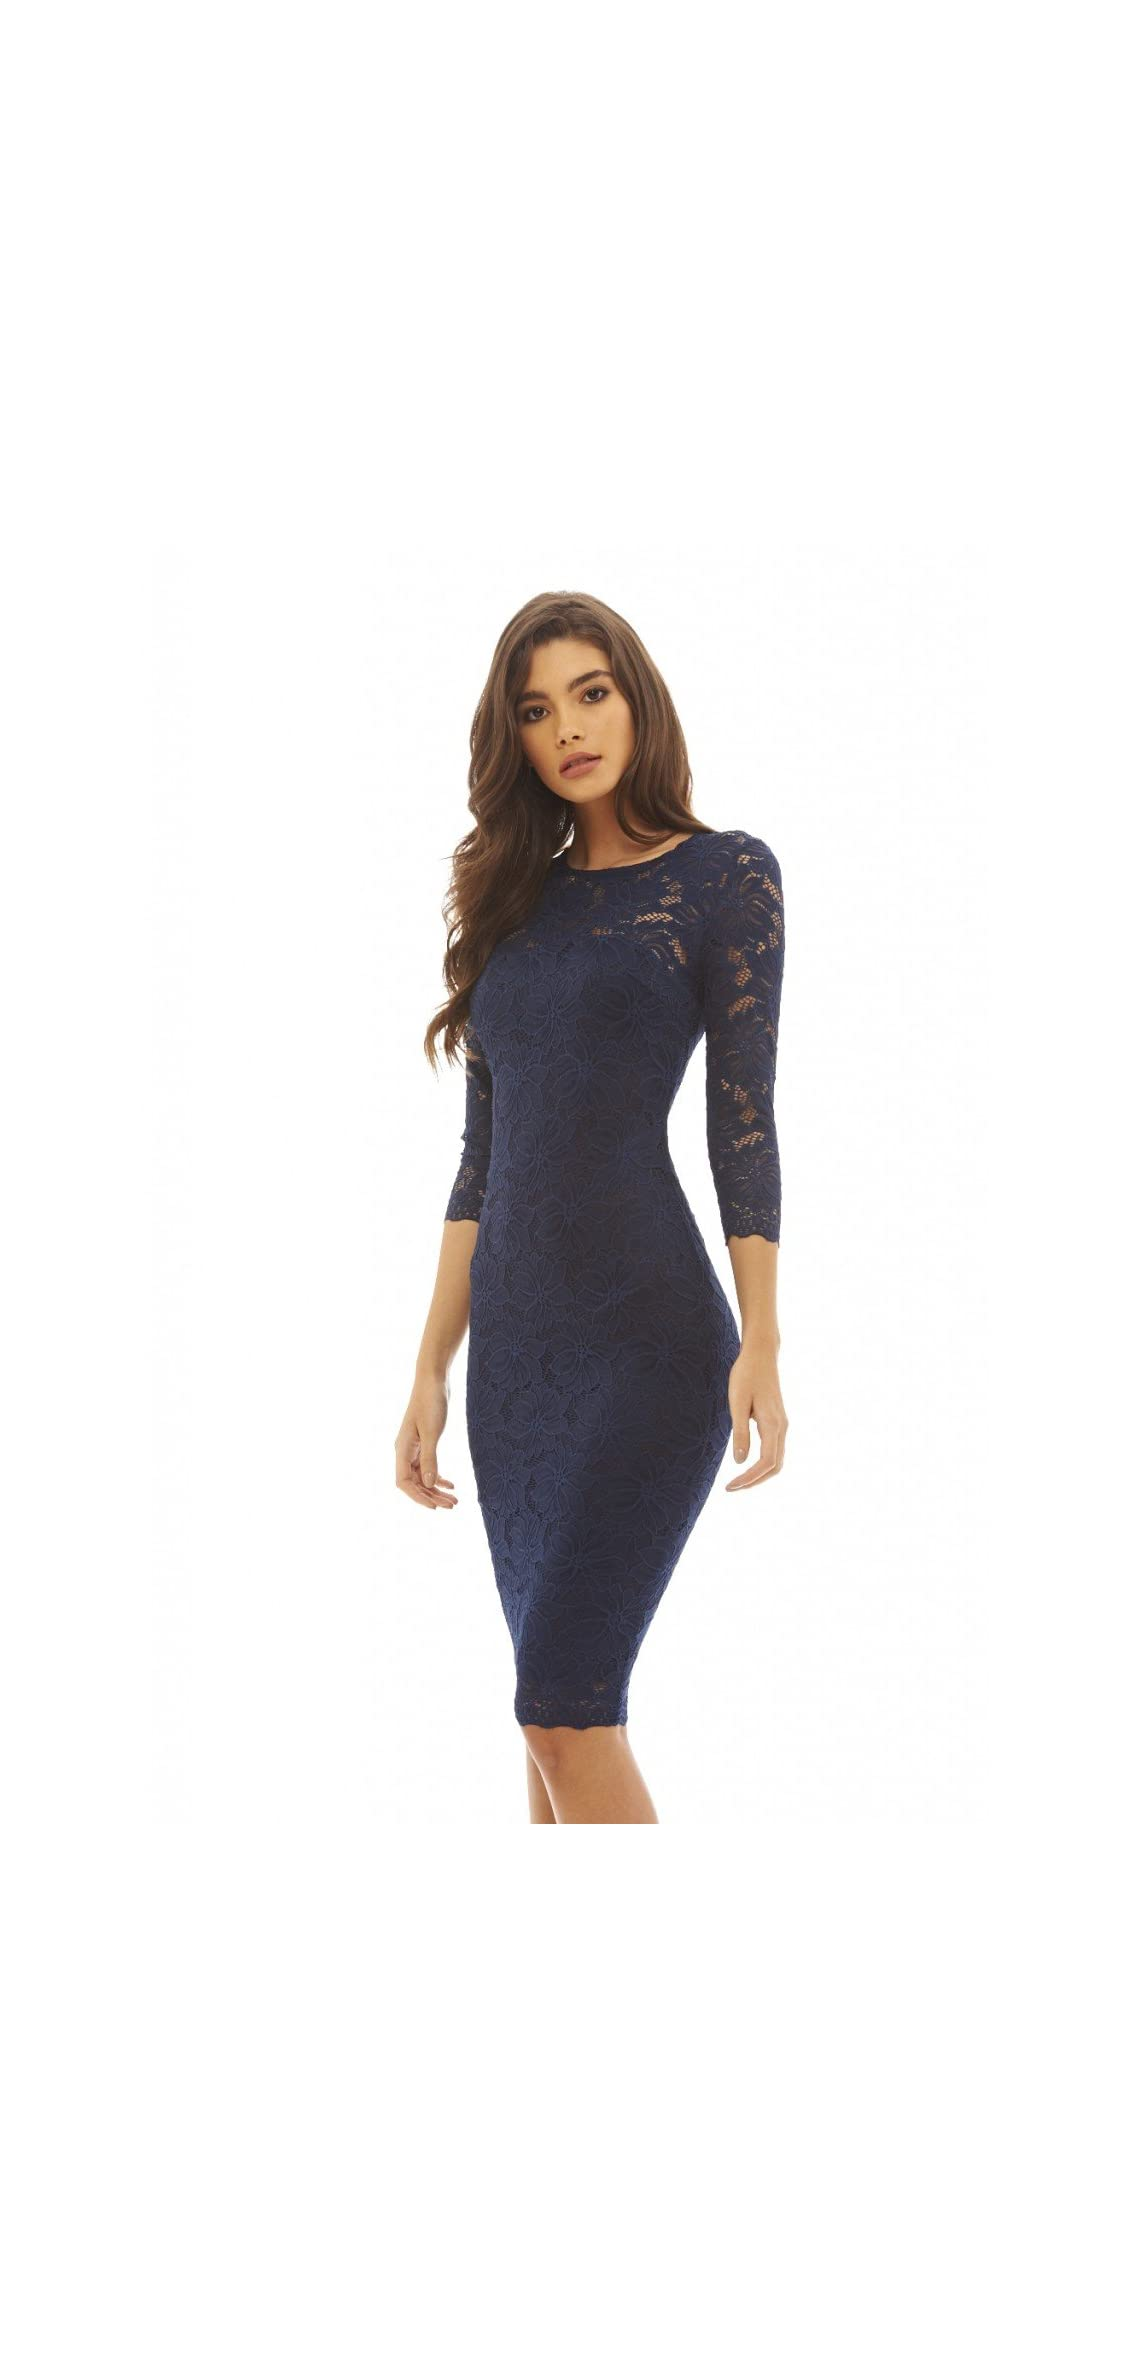 Ax Paris Women's / Sleeve Lace Bodycon